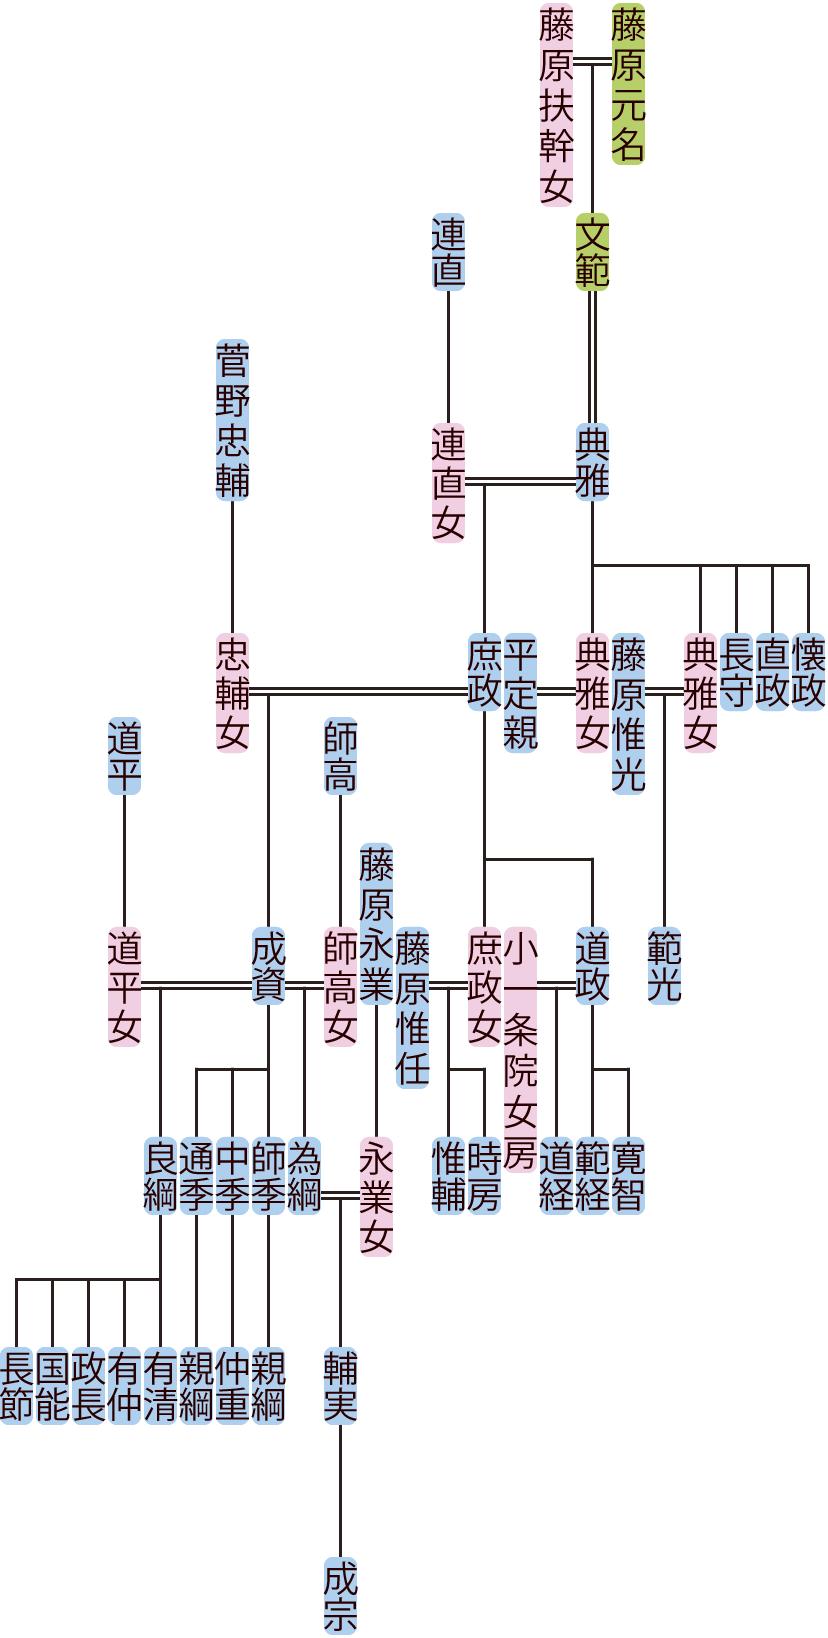 藤原典雅の系図